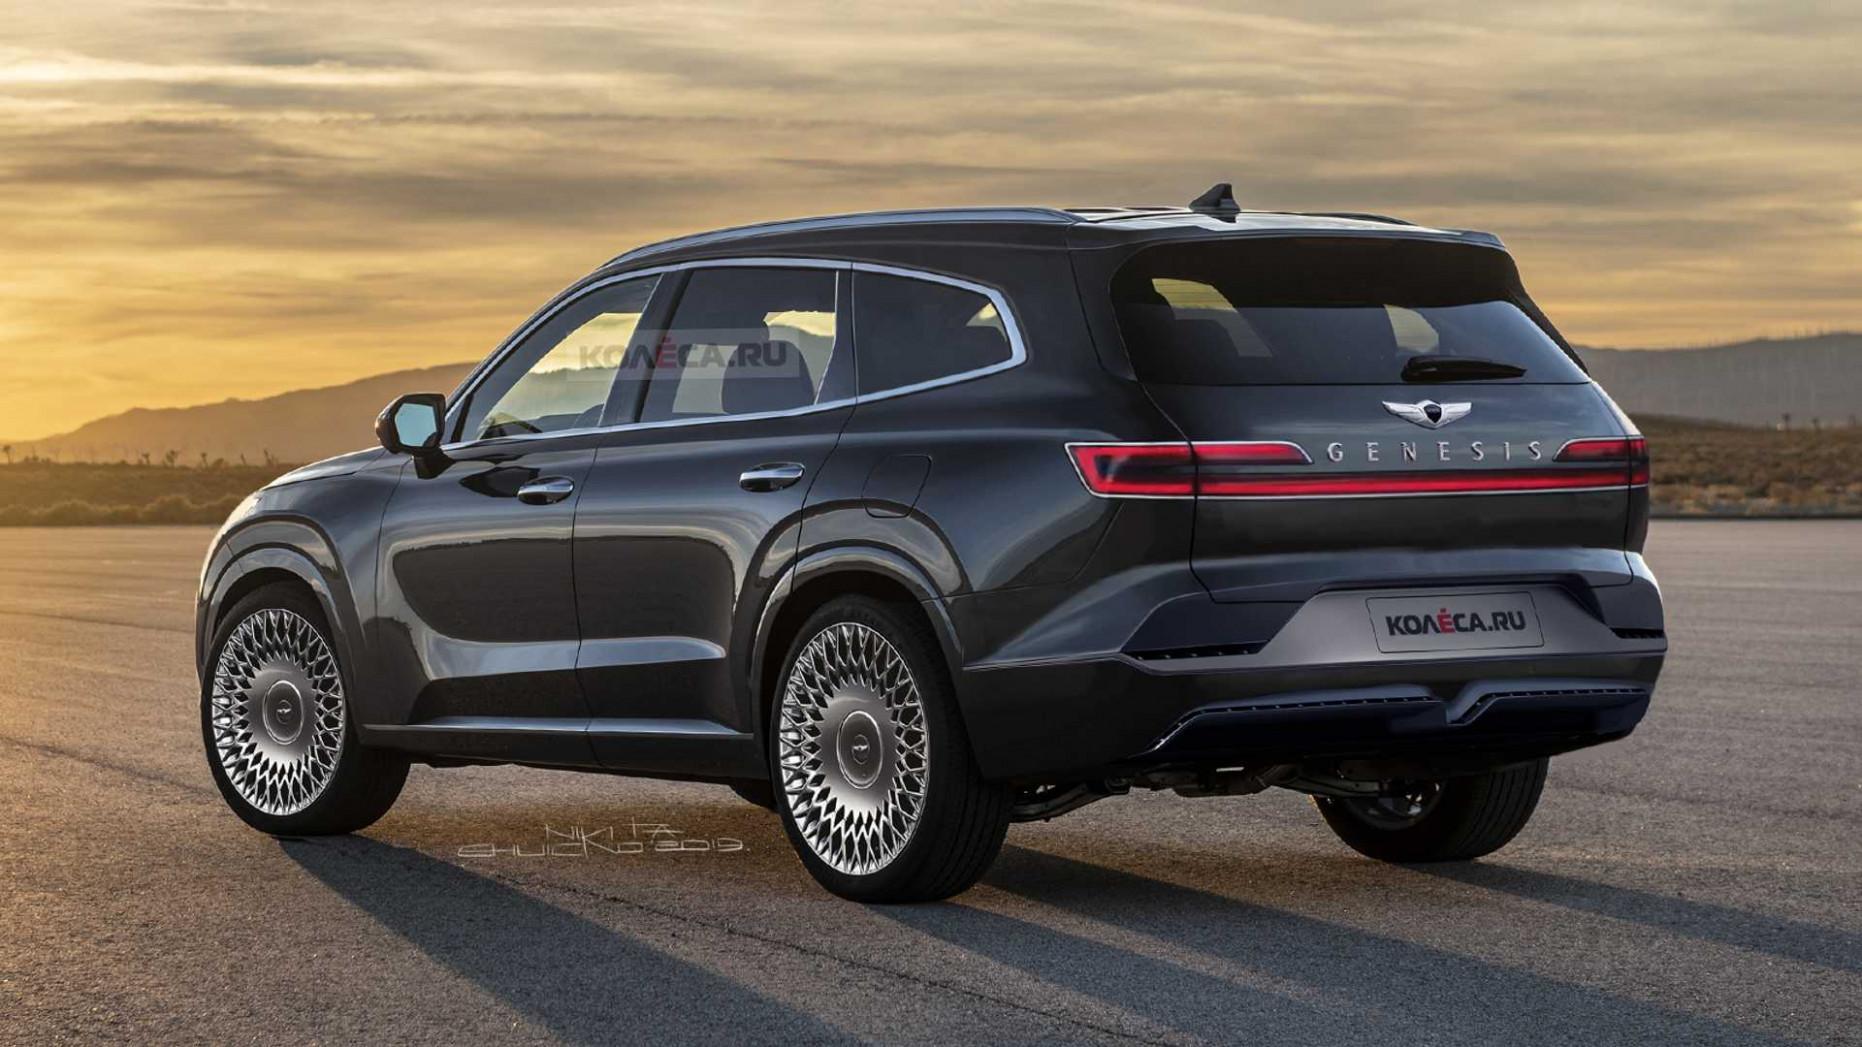 Picture 2022 Hyundai Genesis